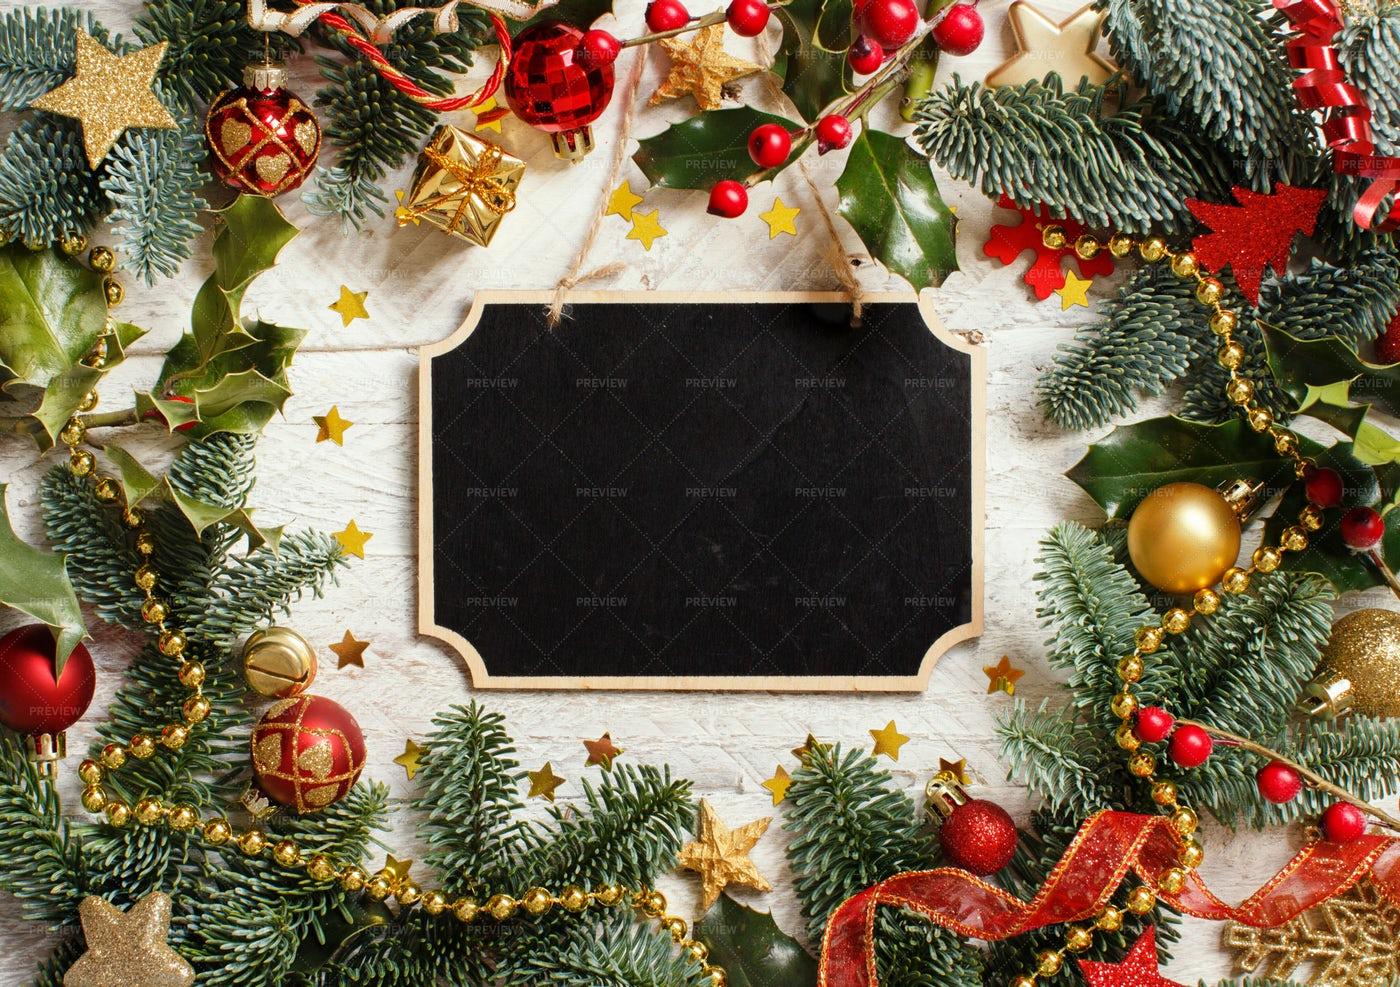 Christmas Chalkboard Frame Background: Stock Photos